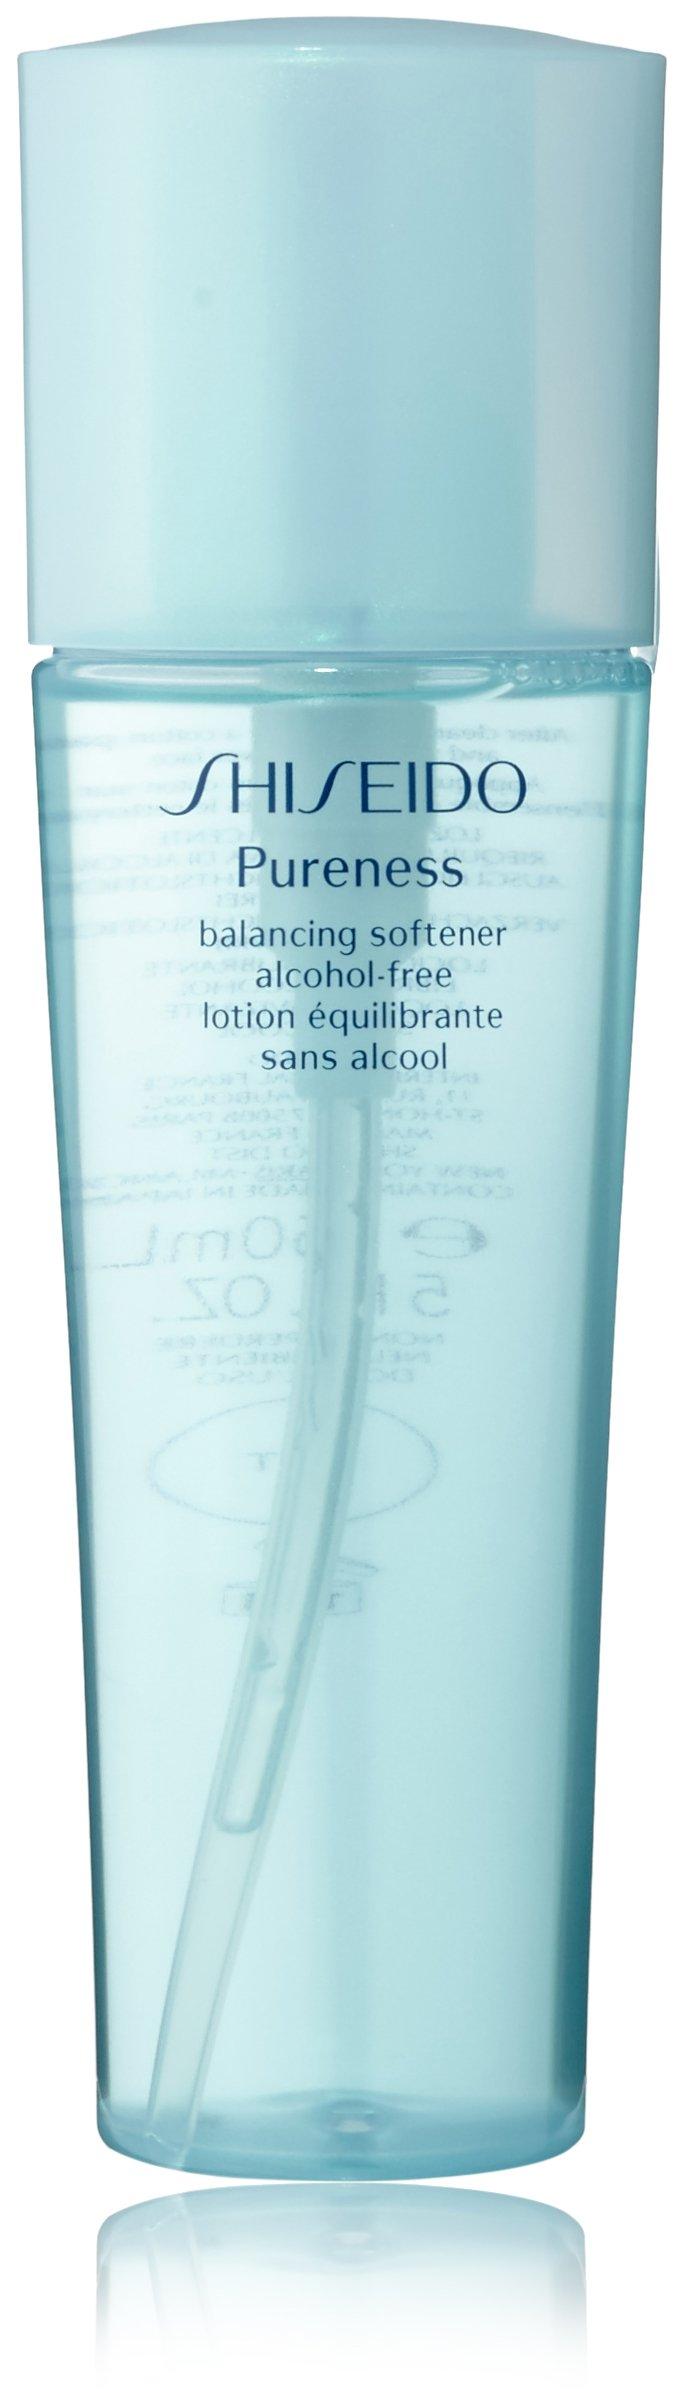 Shiseido Pureness Balancing Softener for Unisex, 5 Ounce by Shiseido (Image #1)